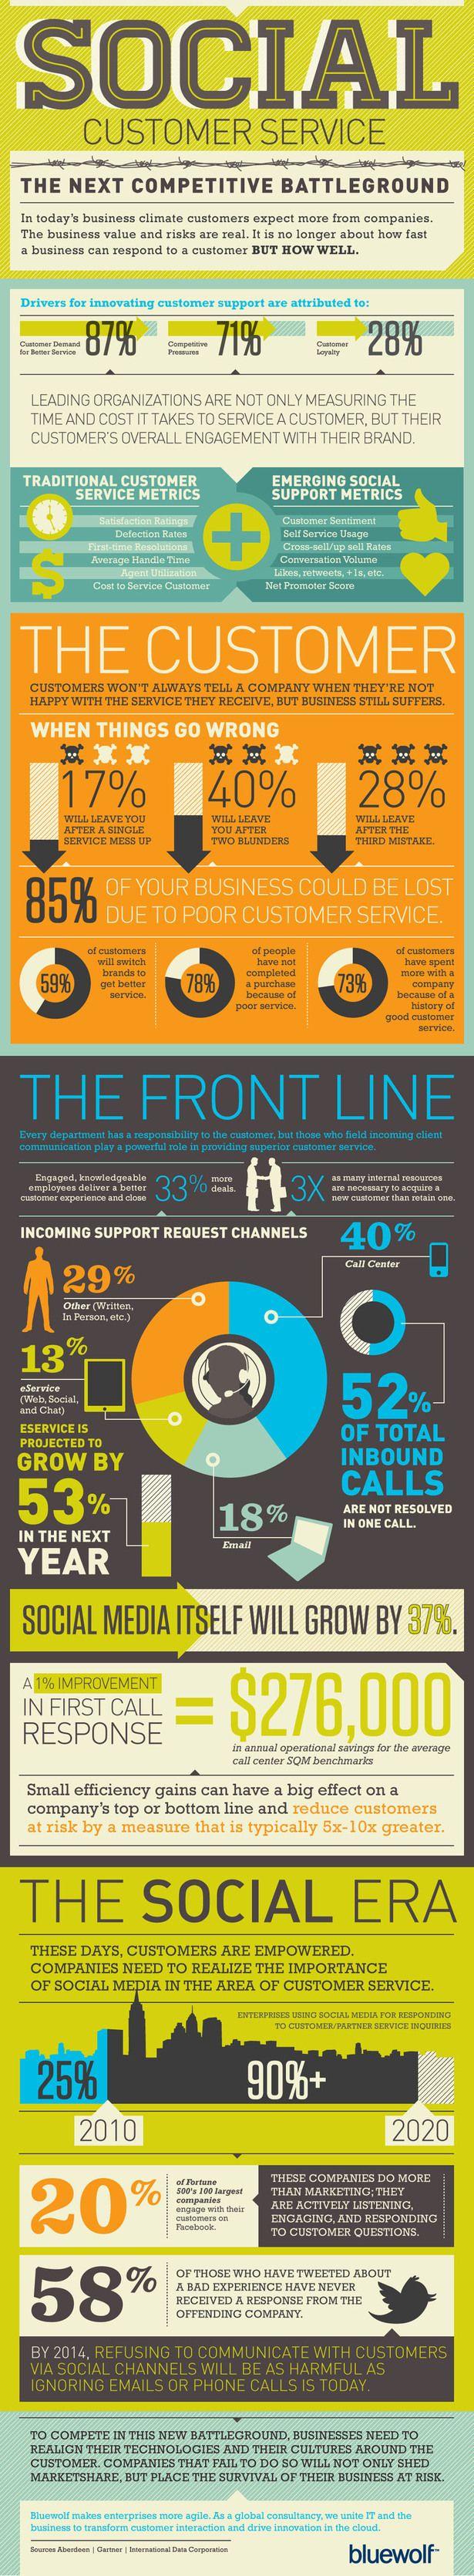 Social Media Customer Service is the next battleground [infographic] | Banyan Branch #sm